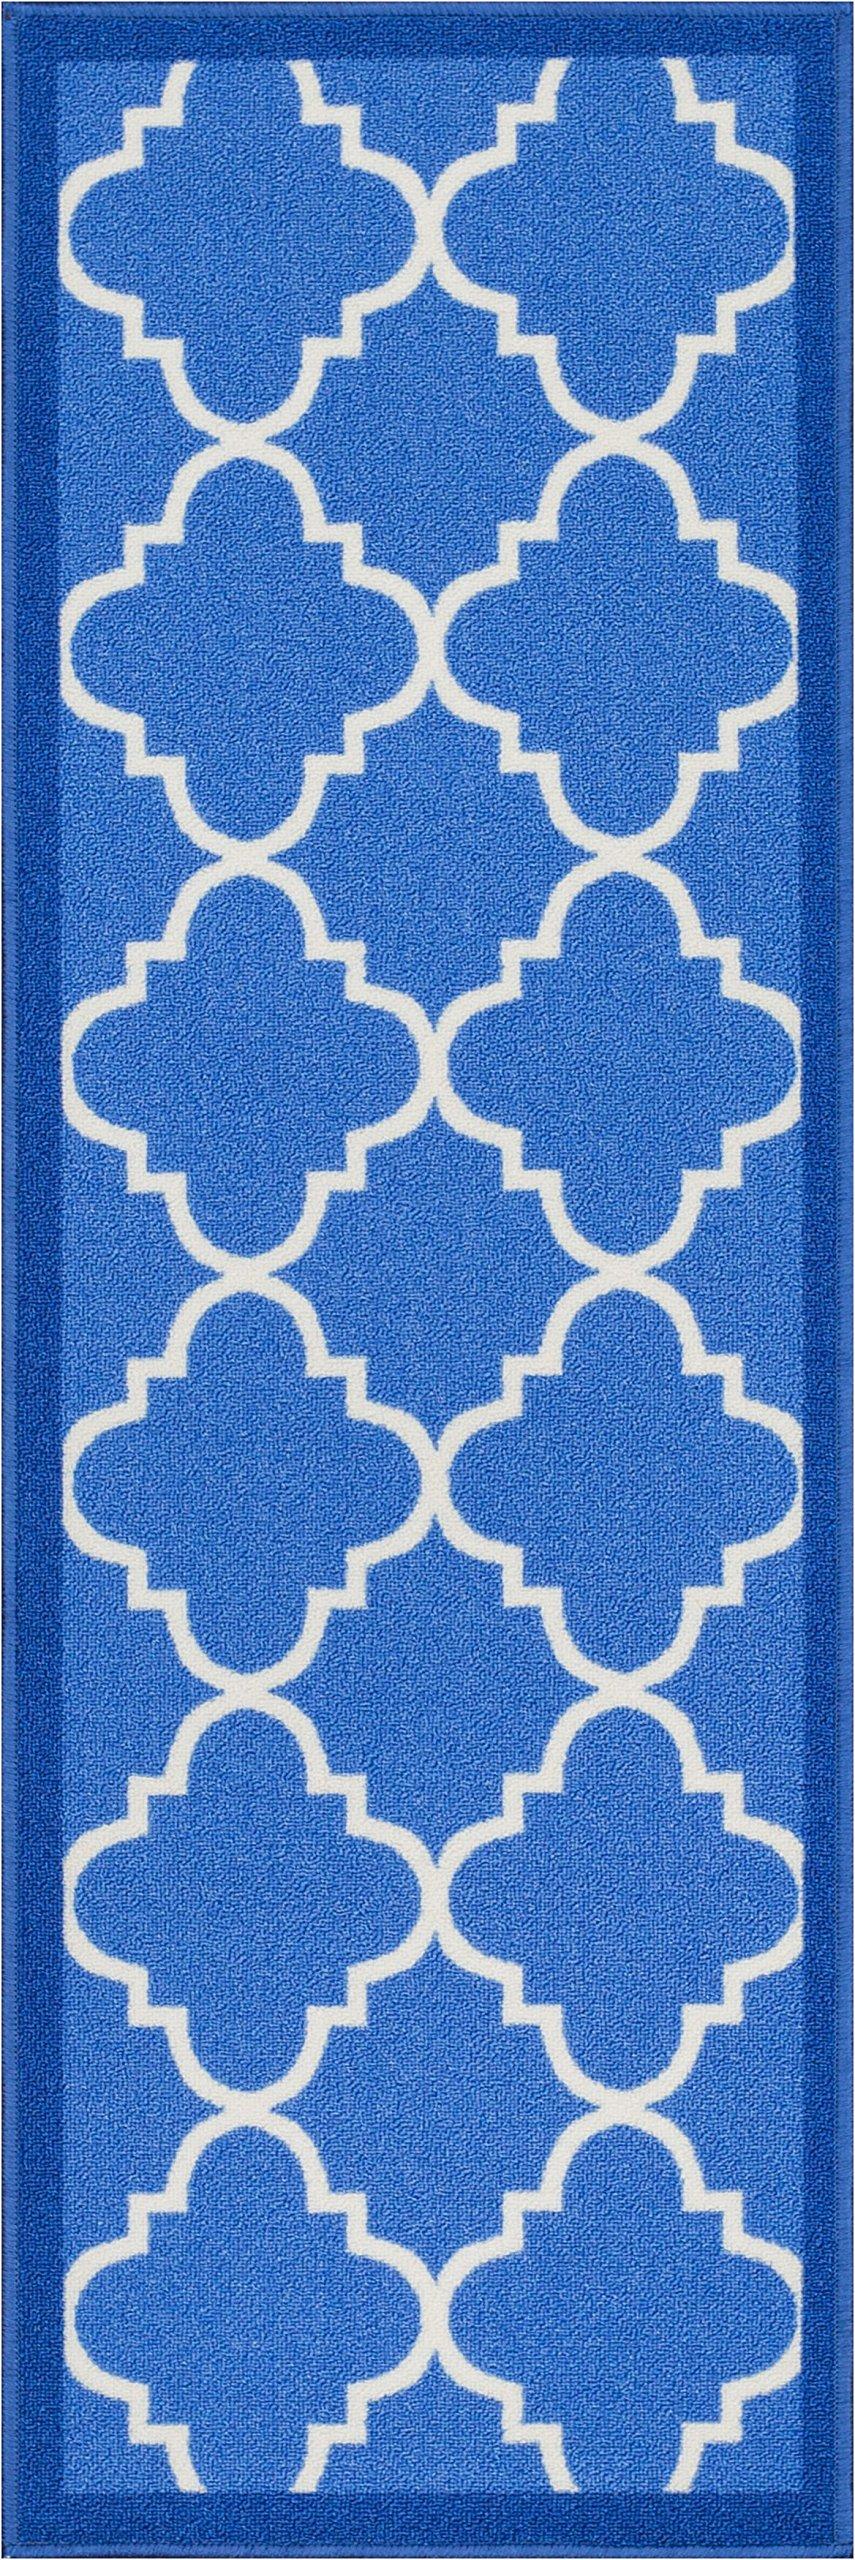 Well Woven 6516-2L Kings Court Brooklyn Trellis Modern Blue Geometric Lattice 2'7'' x 12' Runner Indoor/Outdoor Area Rug